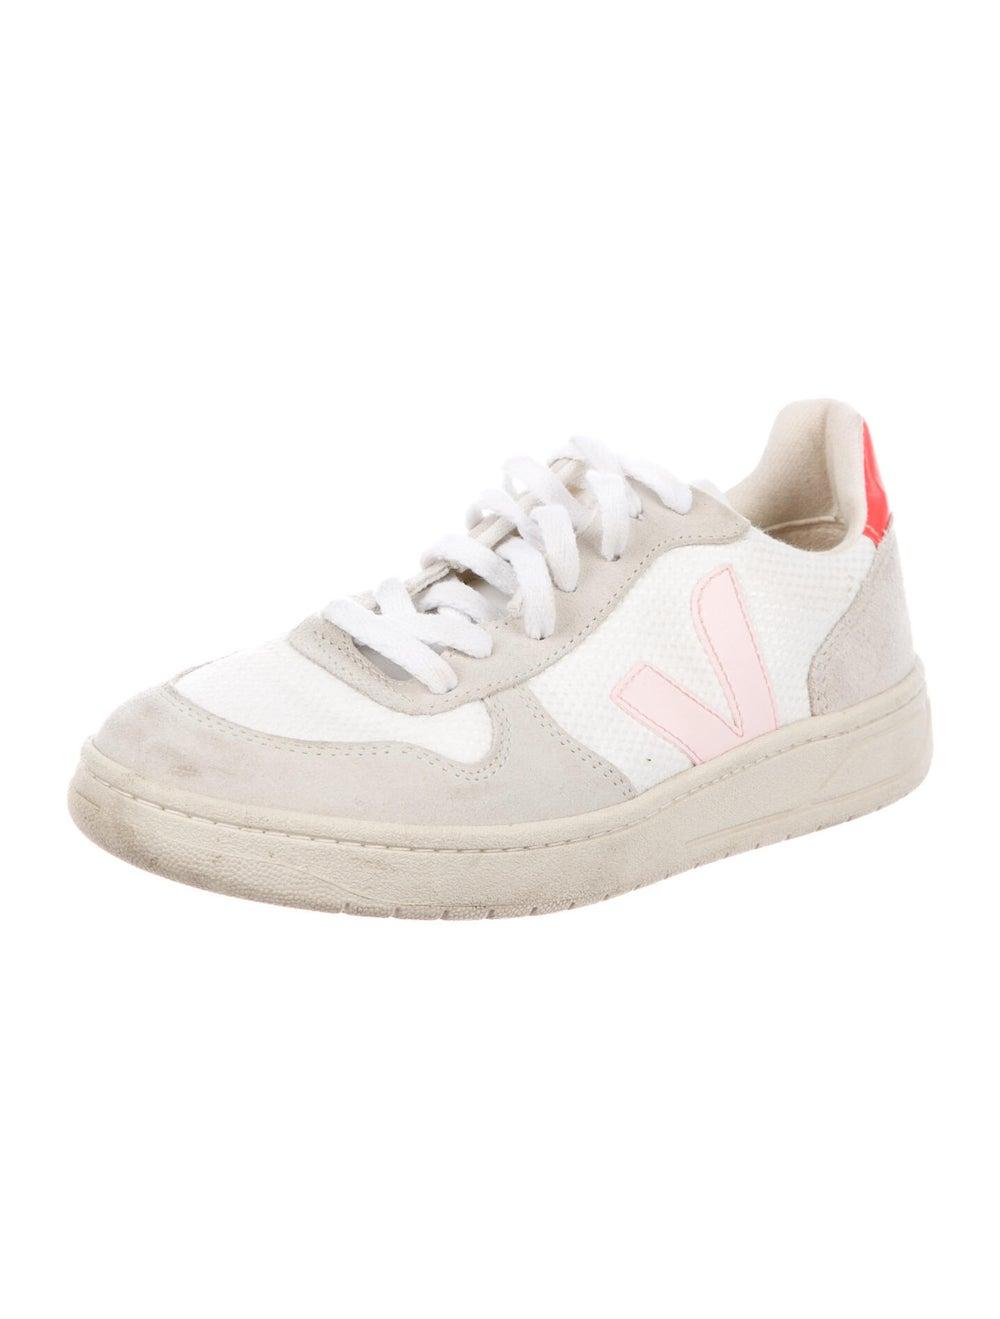 Veja Graphic Print Sneakers - image 2